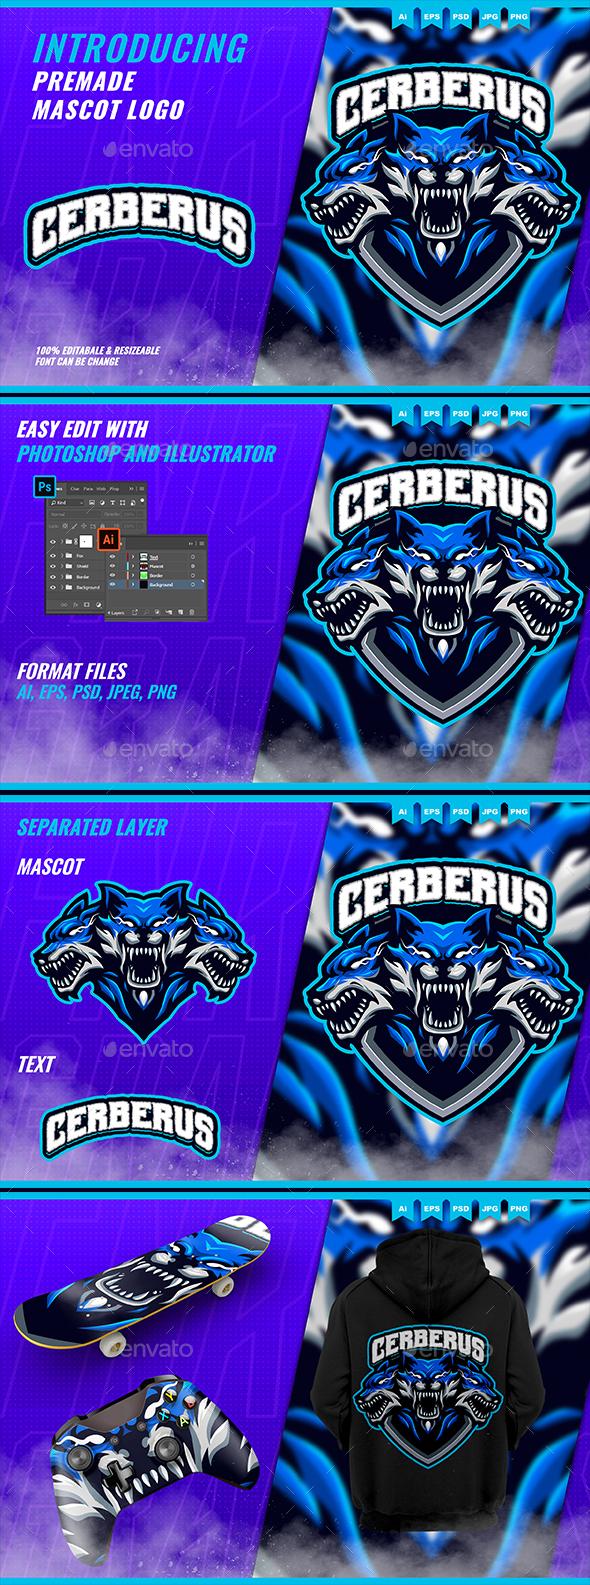 Cerberus Head Hellhound - Mascot Esport Logo Template